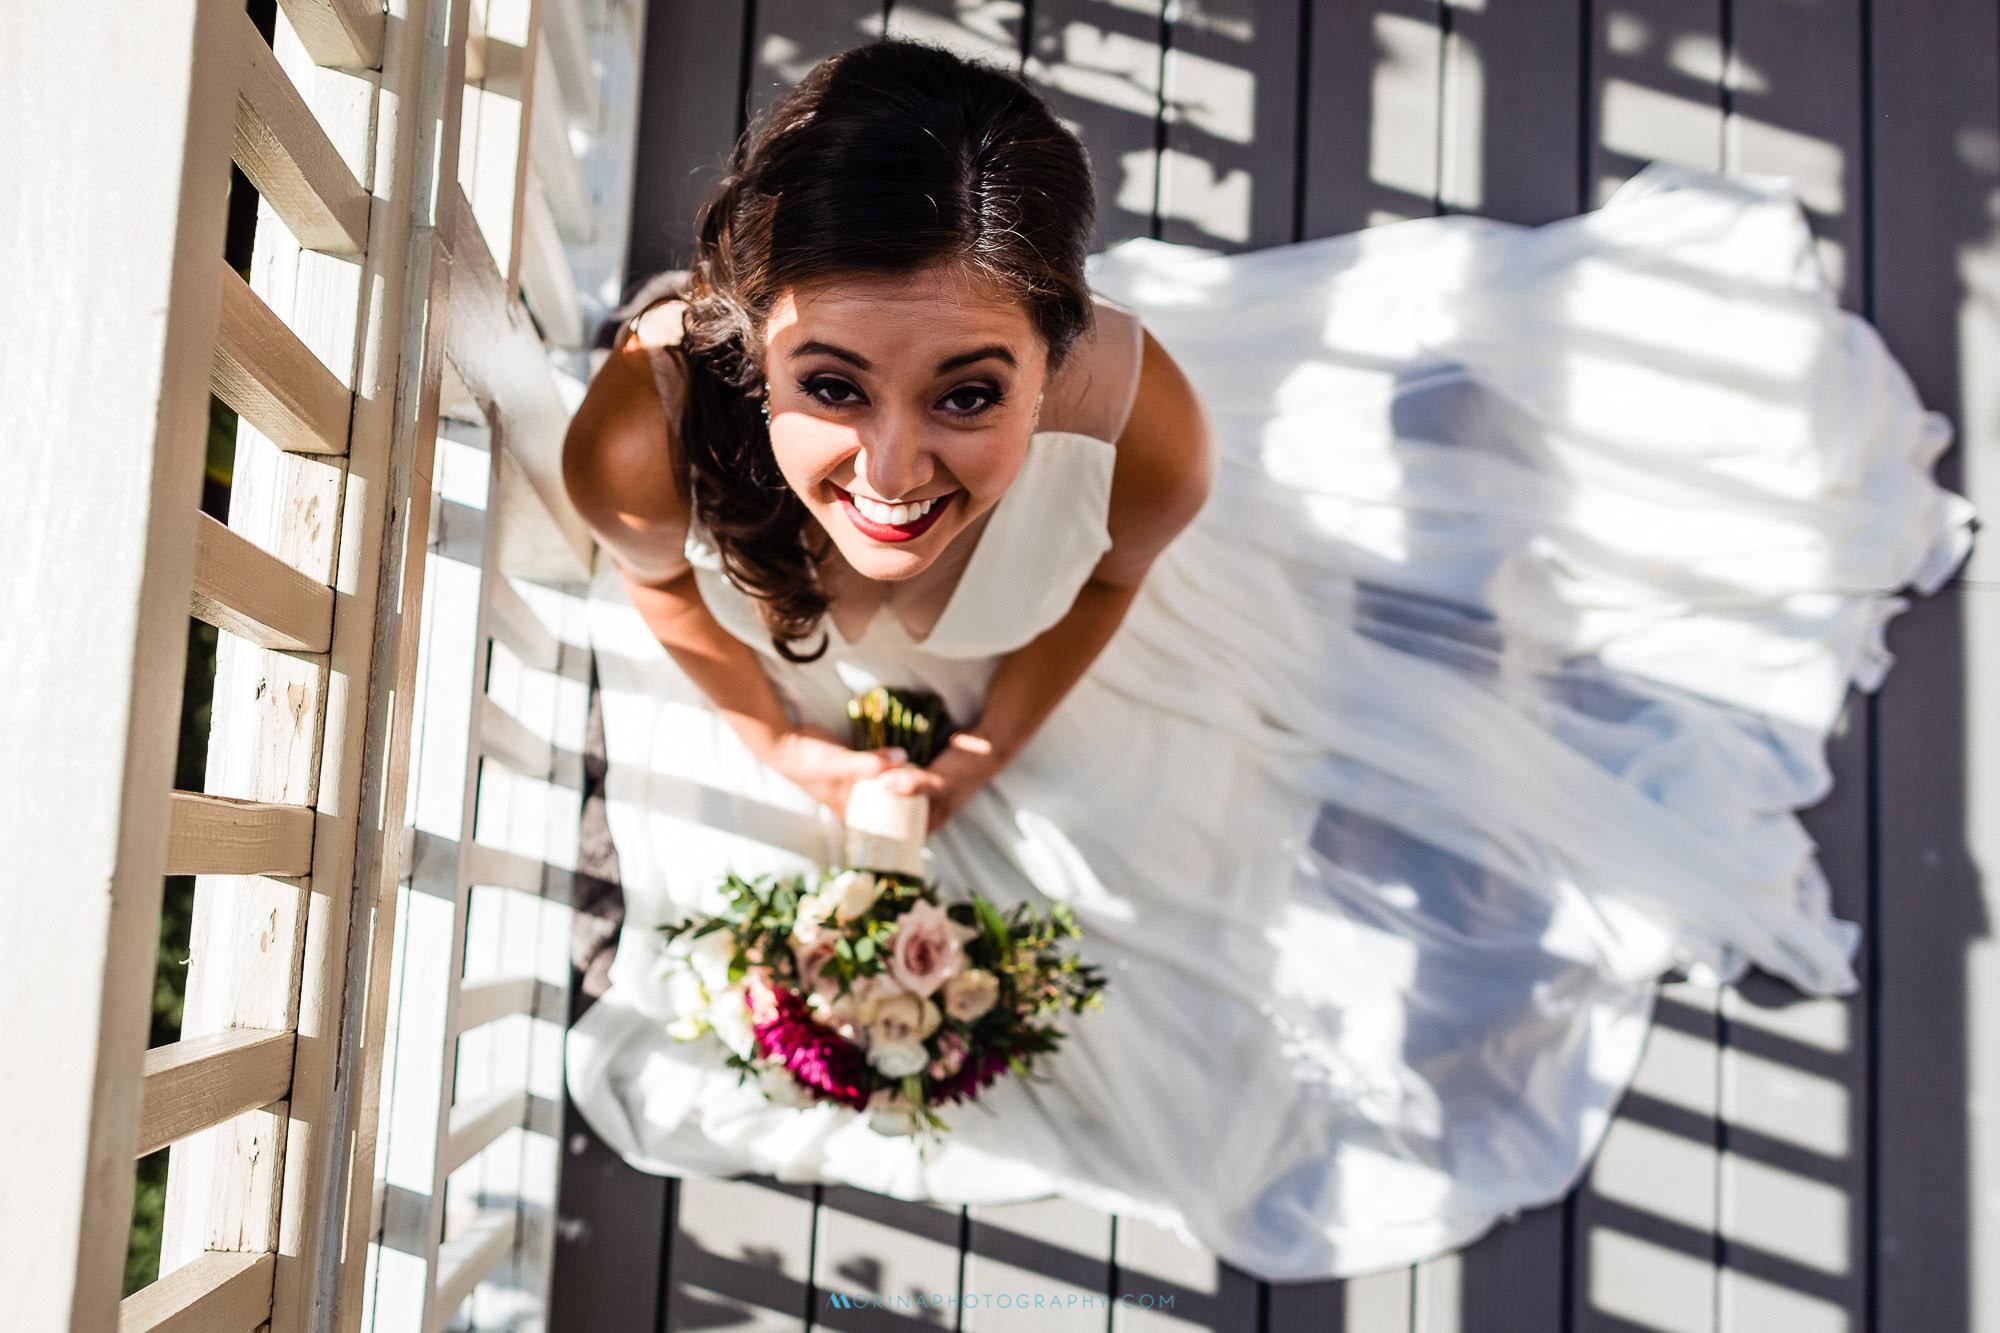 Yuki & Michael Wedding at Morris House Hotel Blog 0023.jpg